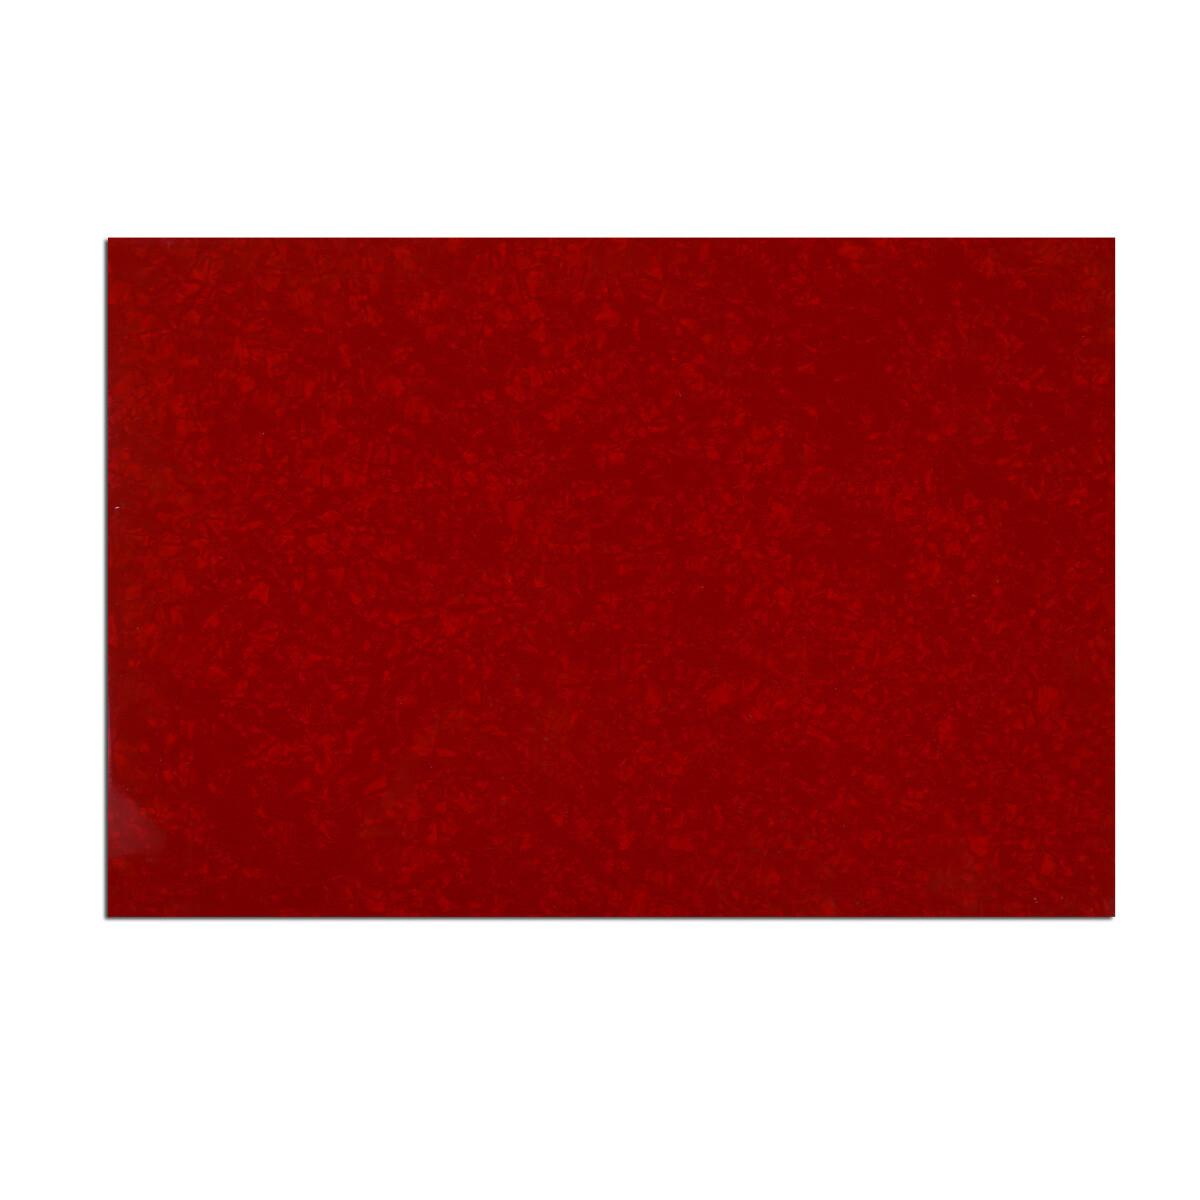 "Brio Pickguard Blanks 12"" x 17"" 4 Ply Pearloid Red"